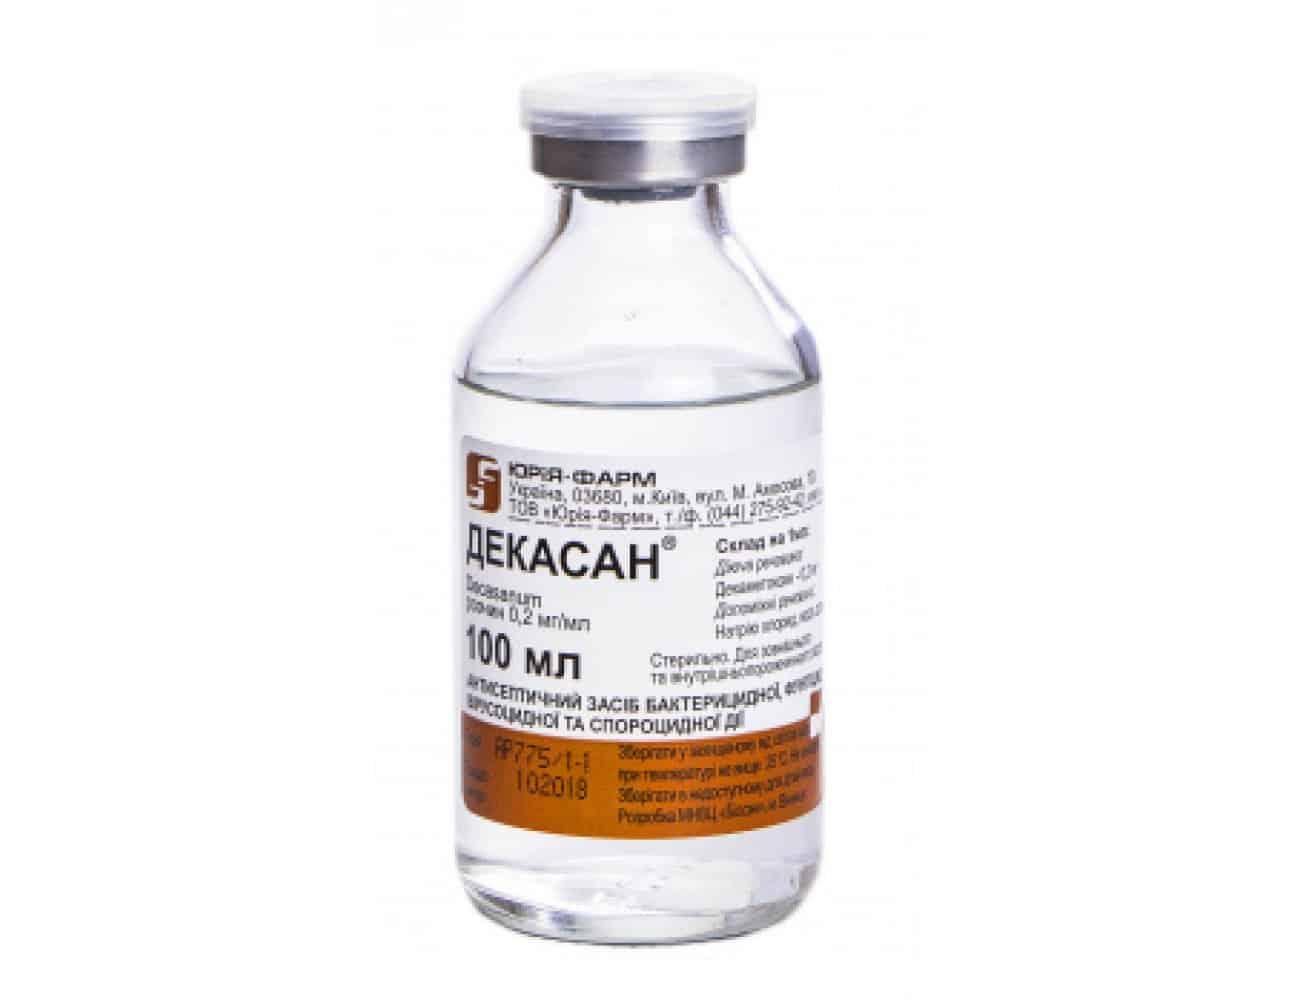 Decasan solution 0.02% 100 ml. vial